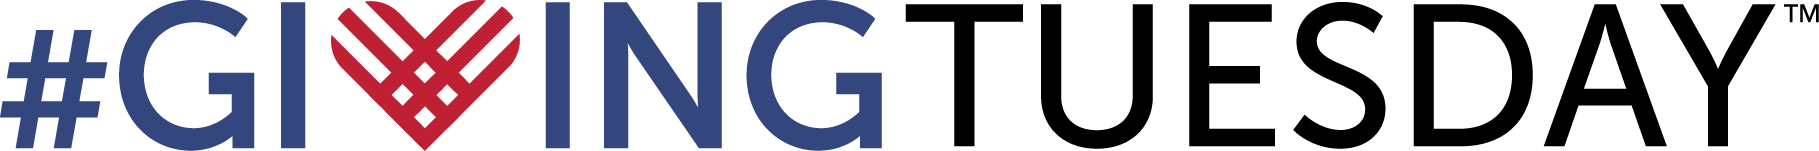 gt_logo2013